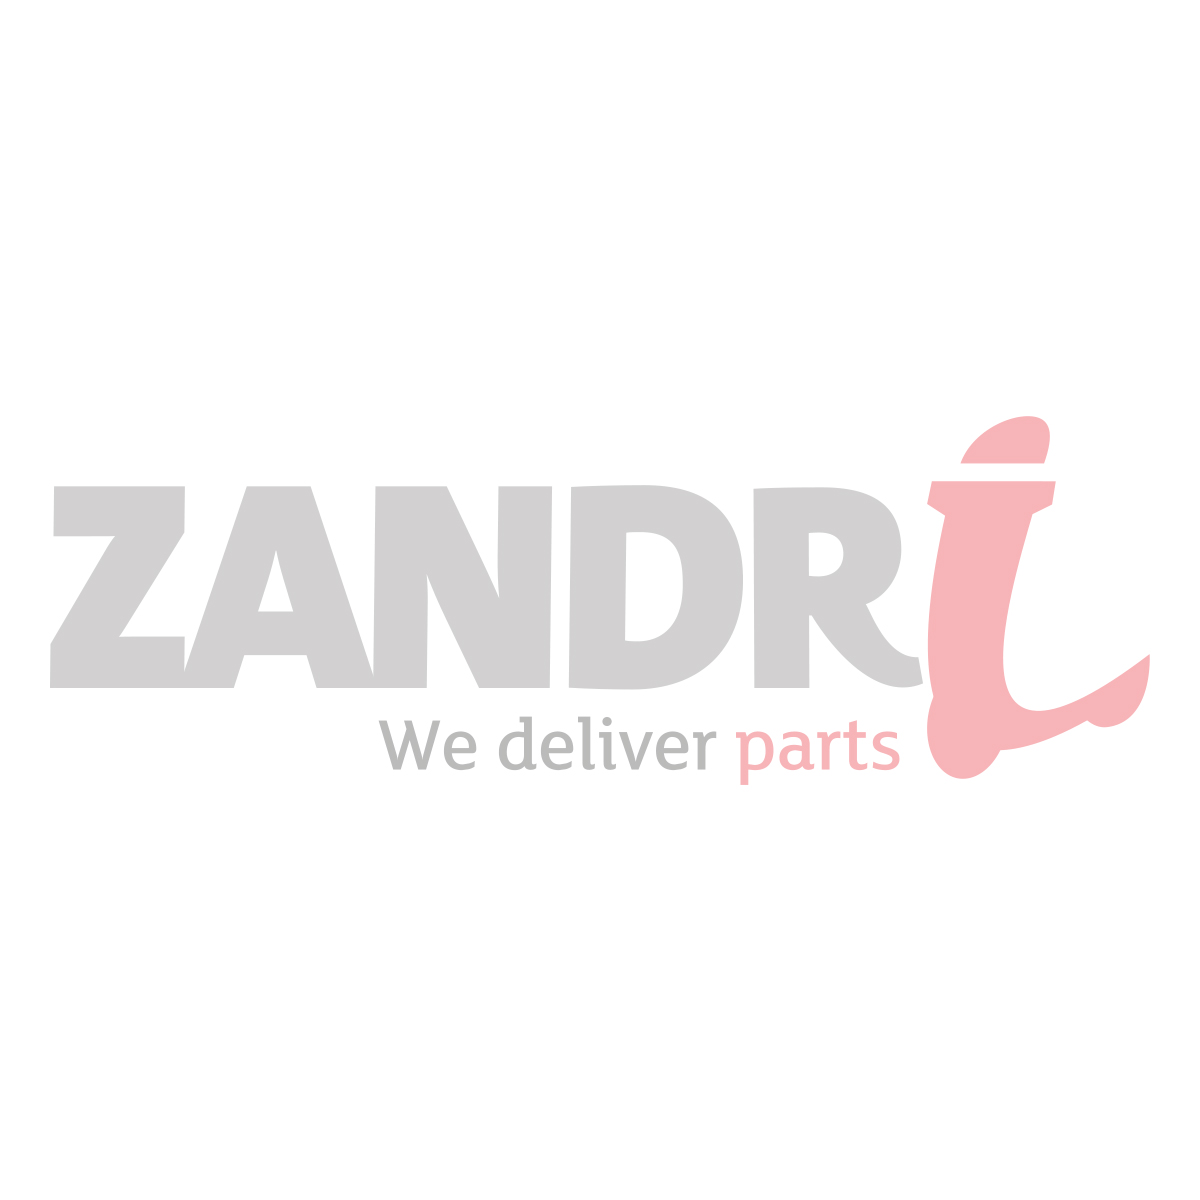 Buddy / Zadelslot Stootrubber Malaguti Centro / F12R origineel 07219400